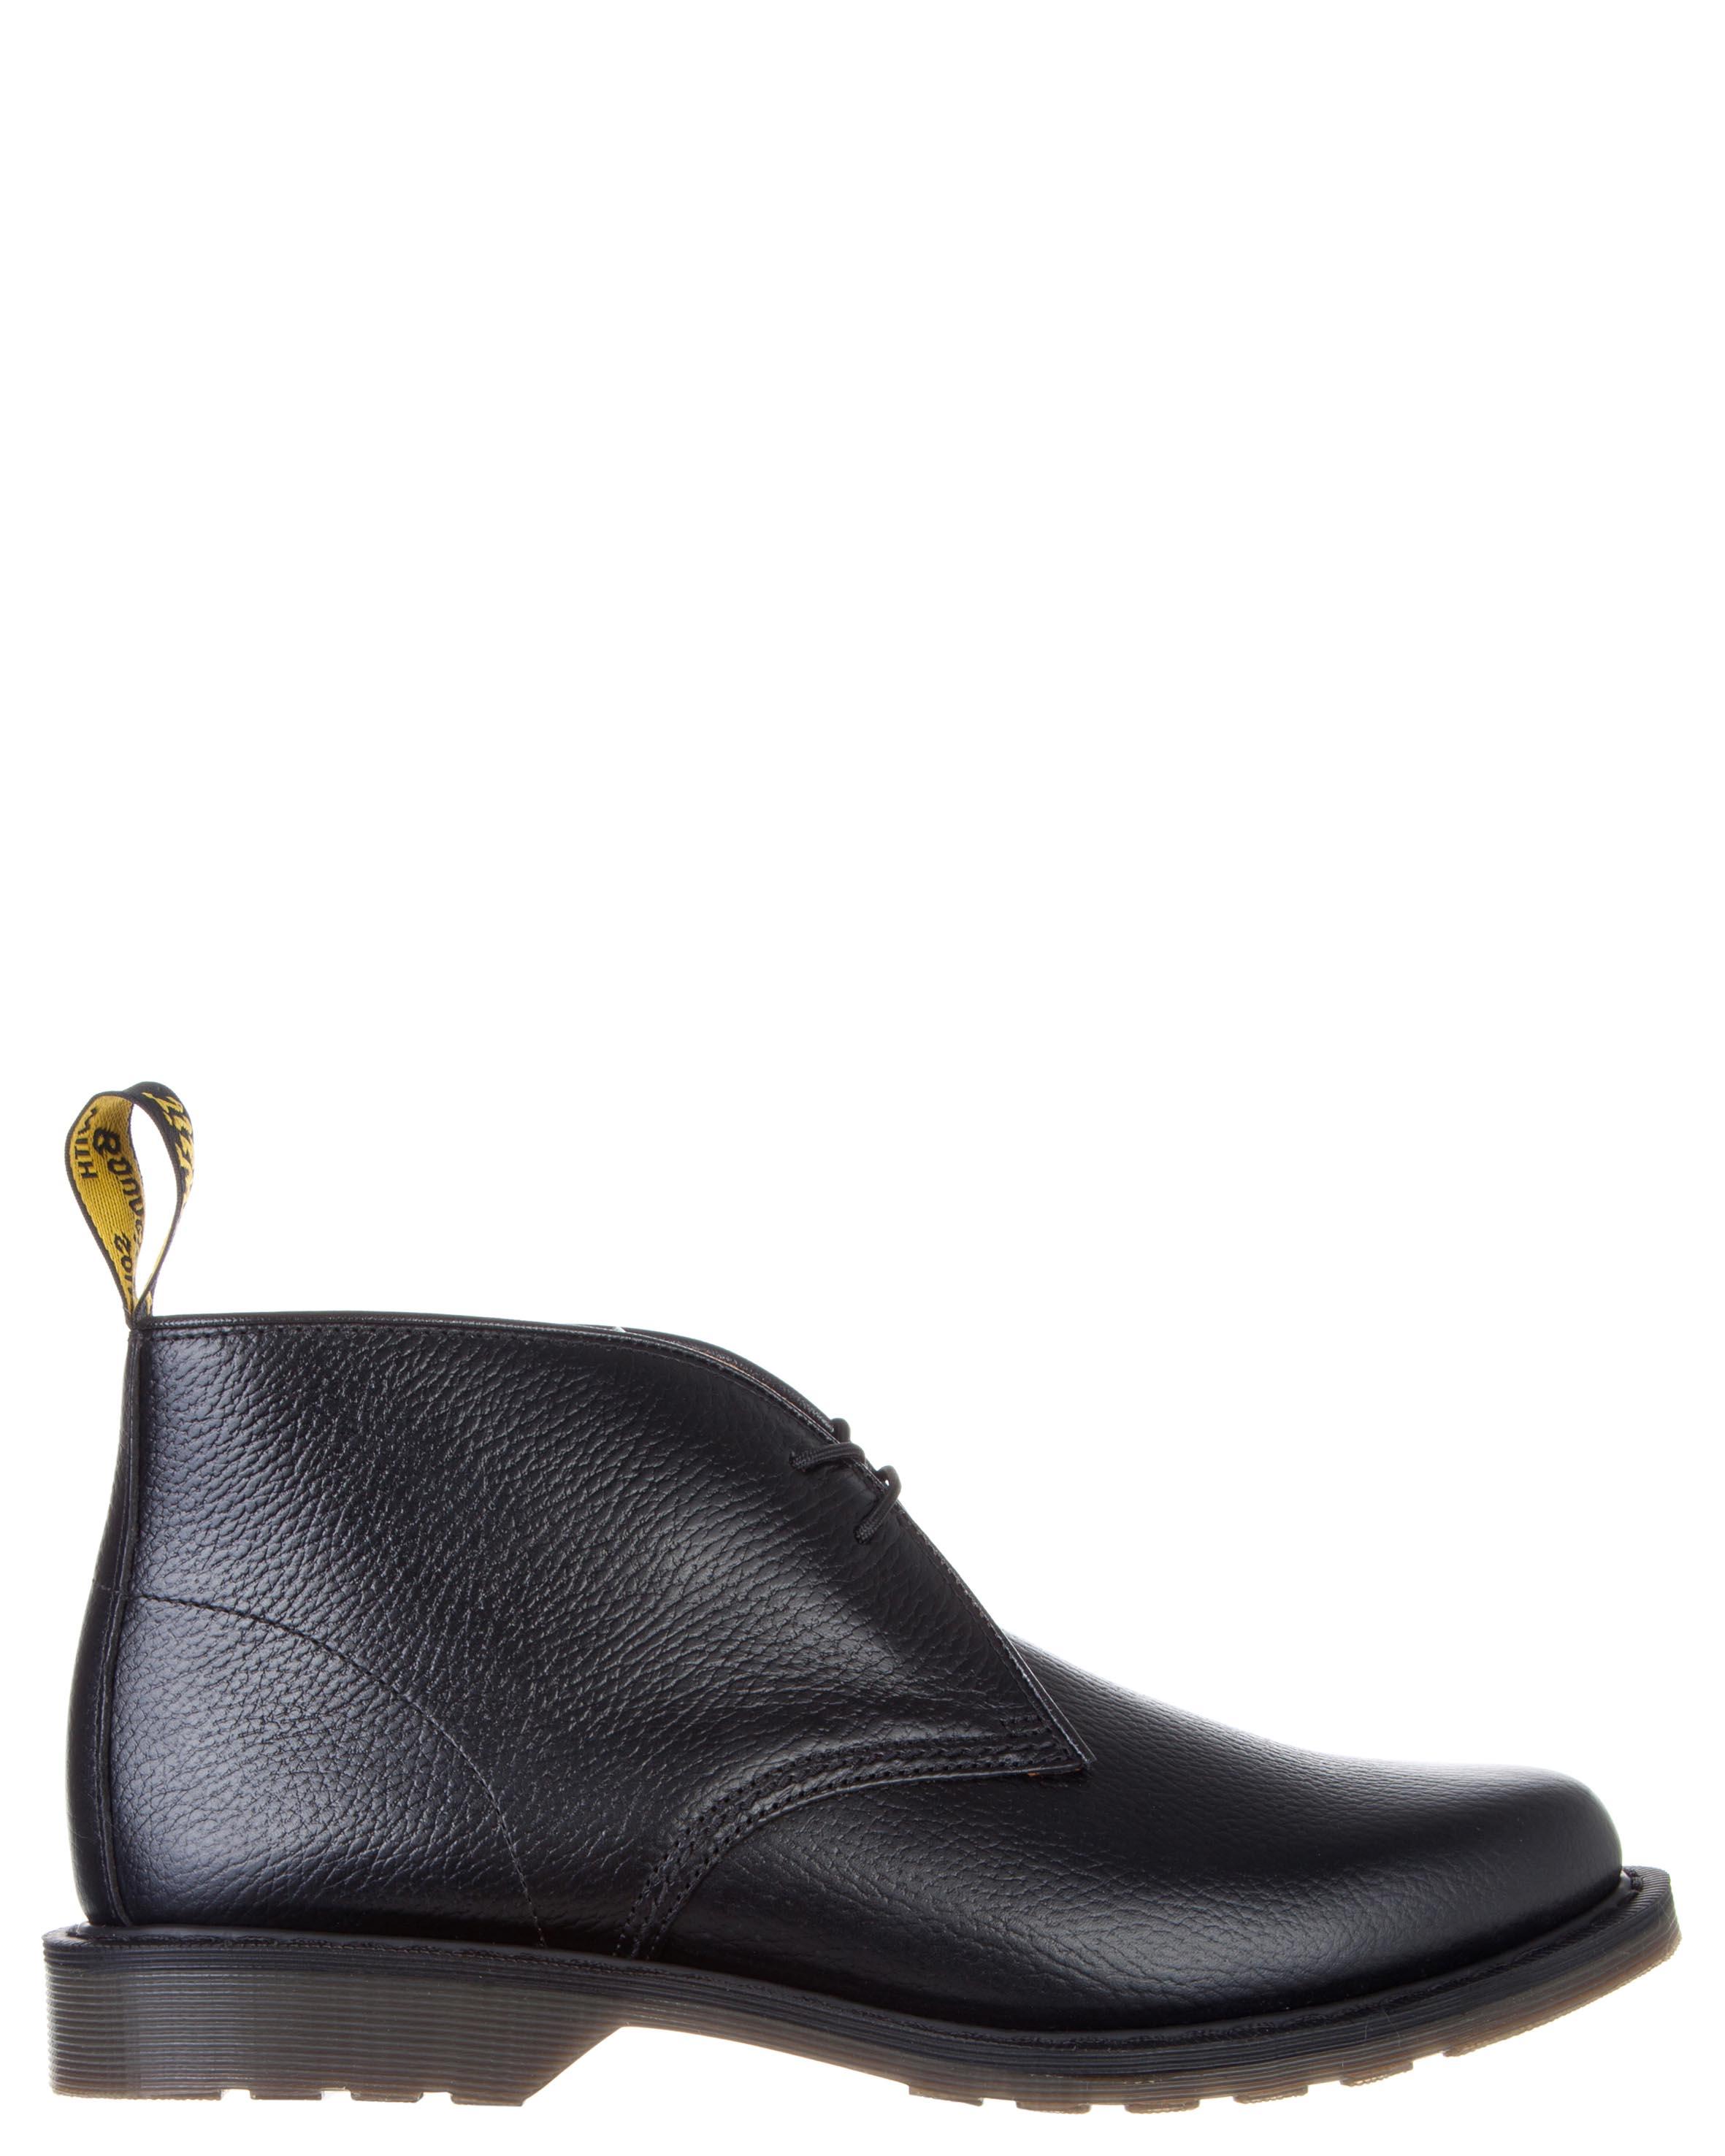 Gucci-Men-Fashion-Dress-Shoes-020-2573.jpg